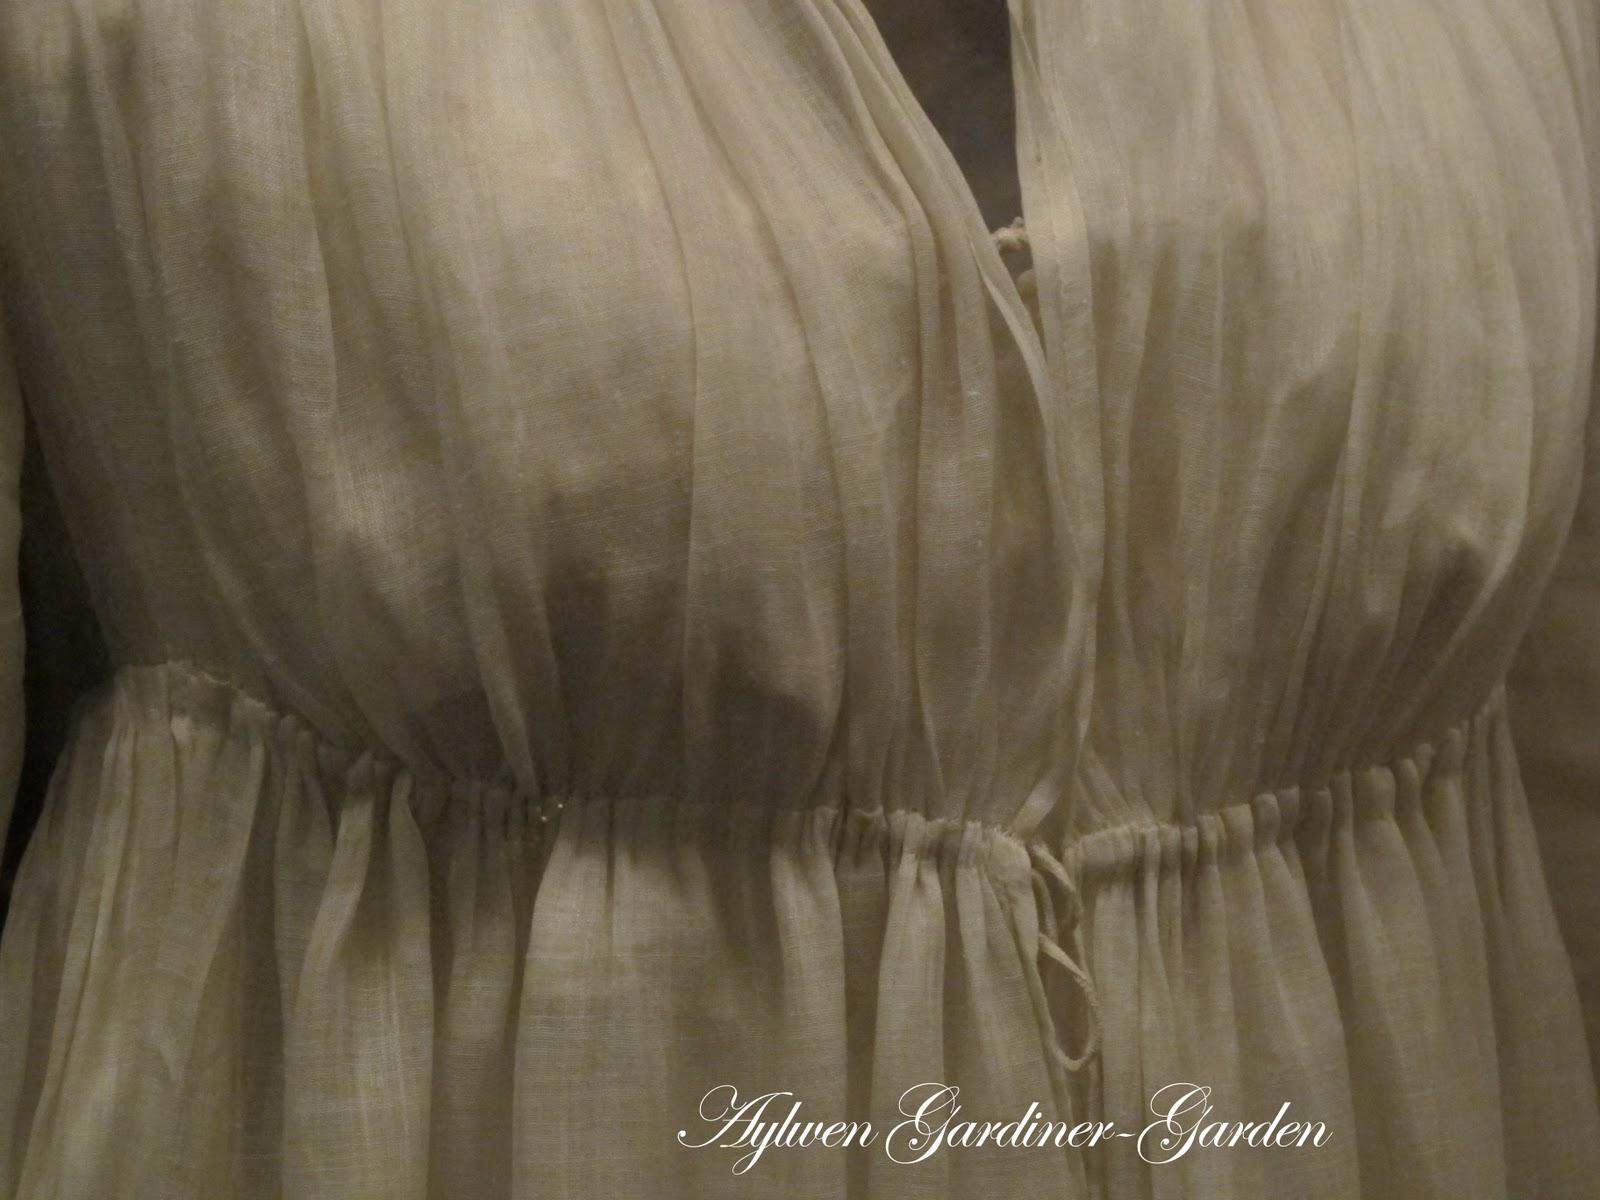 Aylwen Gardiner-Garden: My Tidens Tøj Regency Gown (updated)